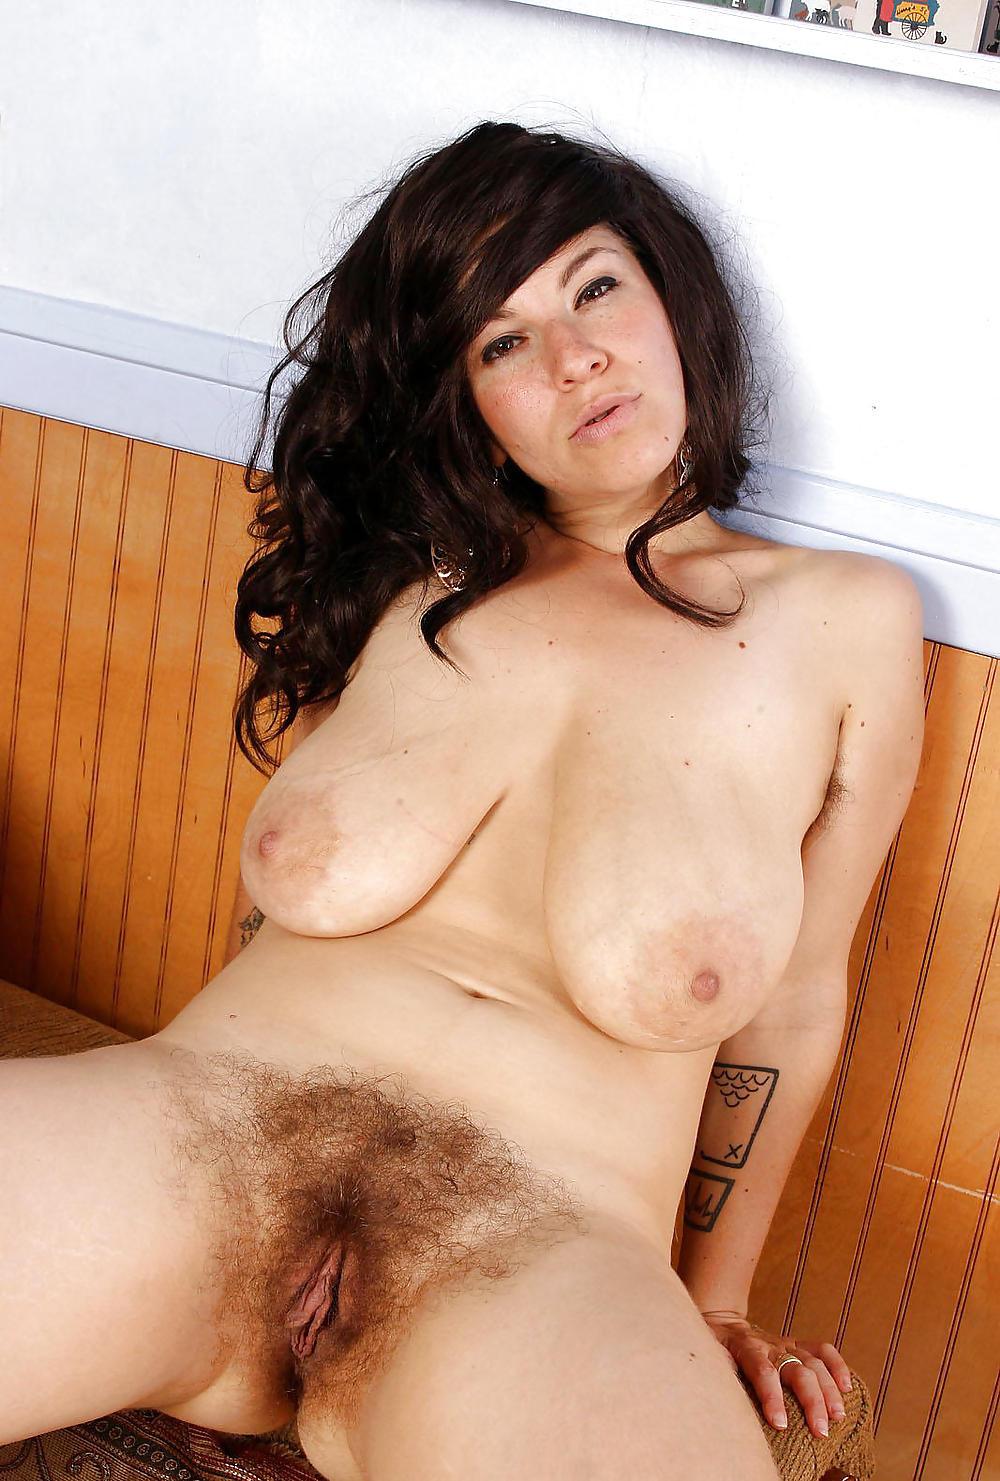 Teen hairy big tits, old men young boys pics